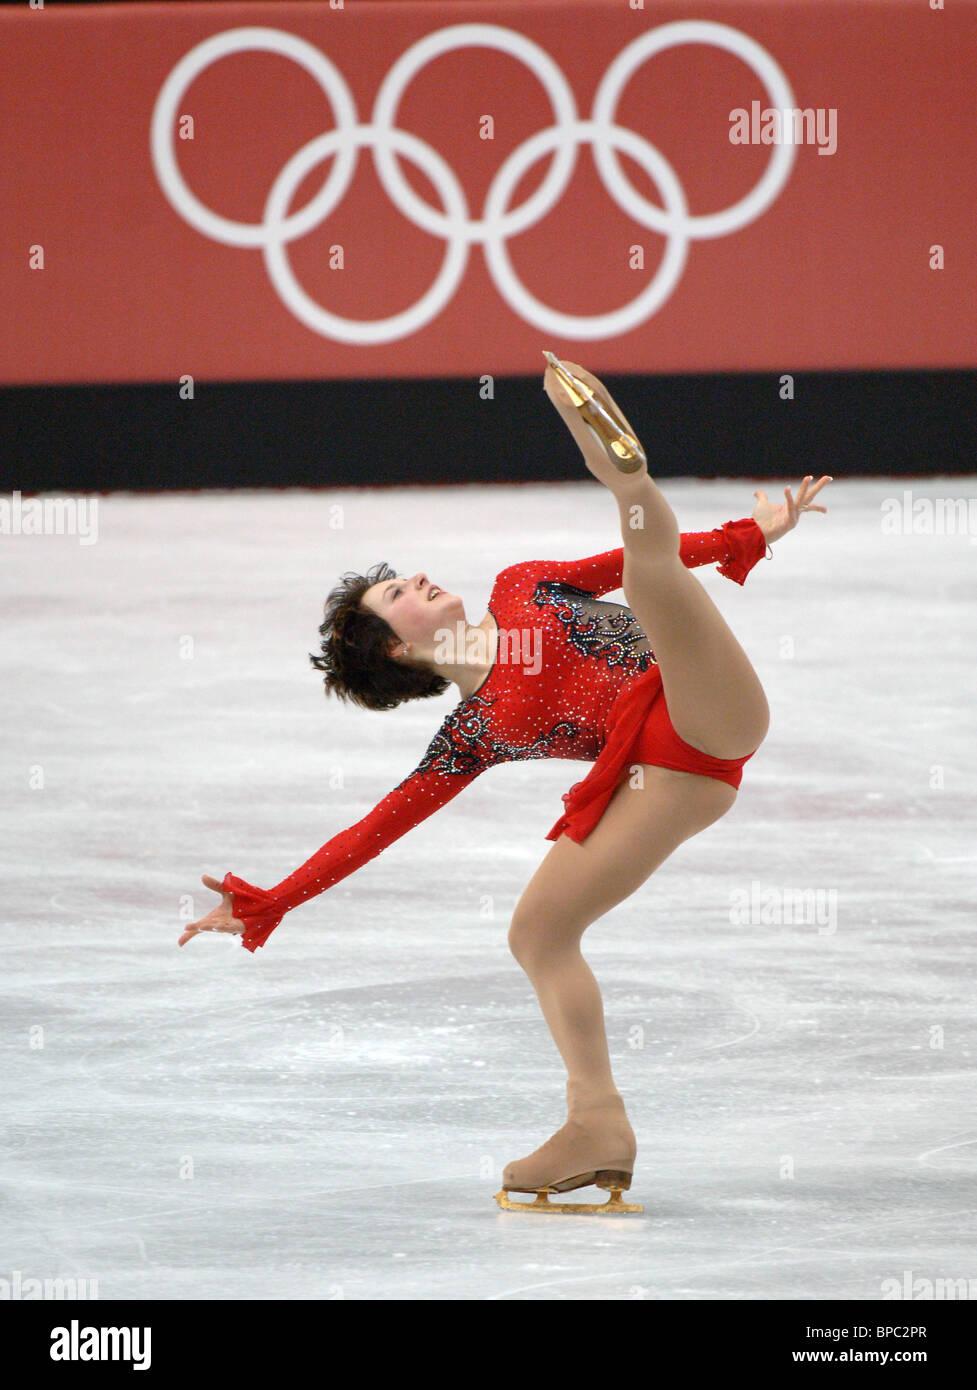 Irina Slutskaya today 44